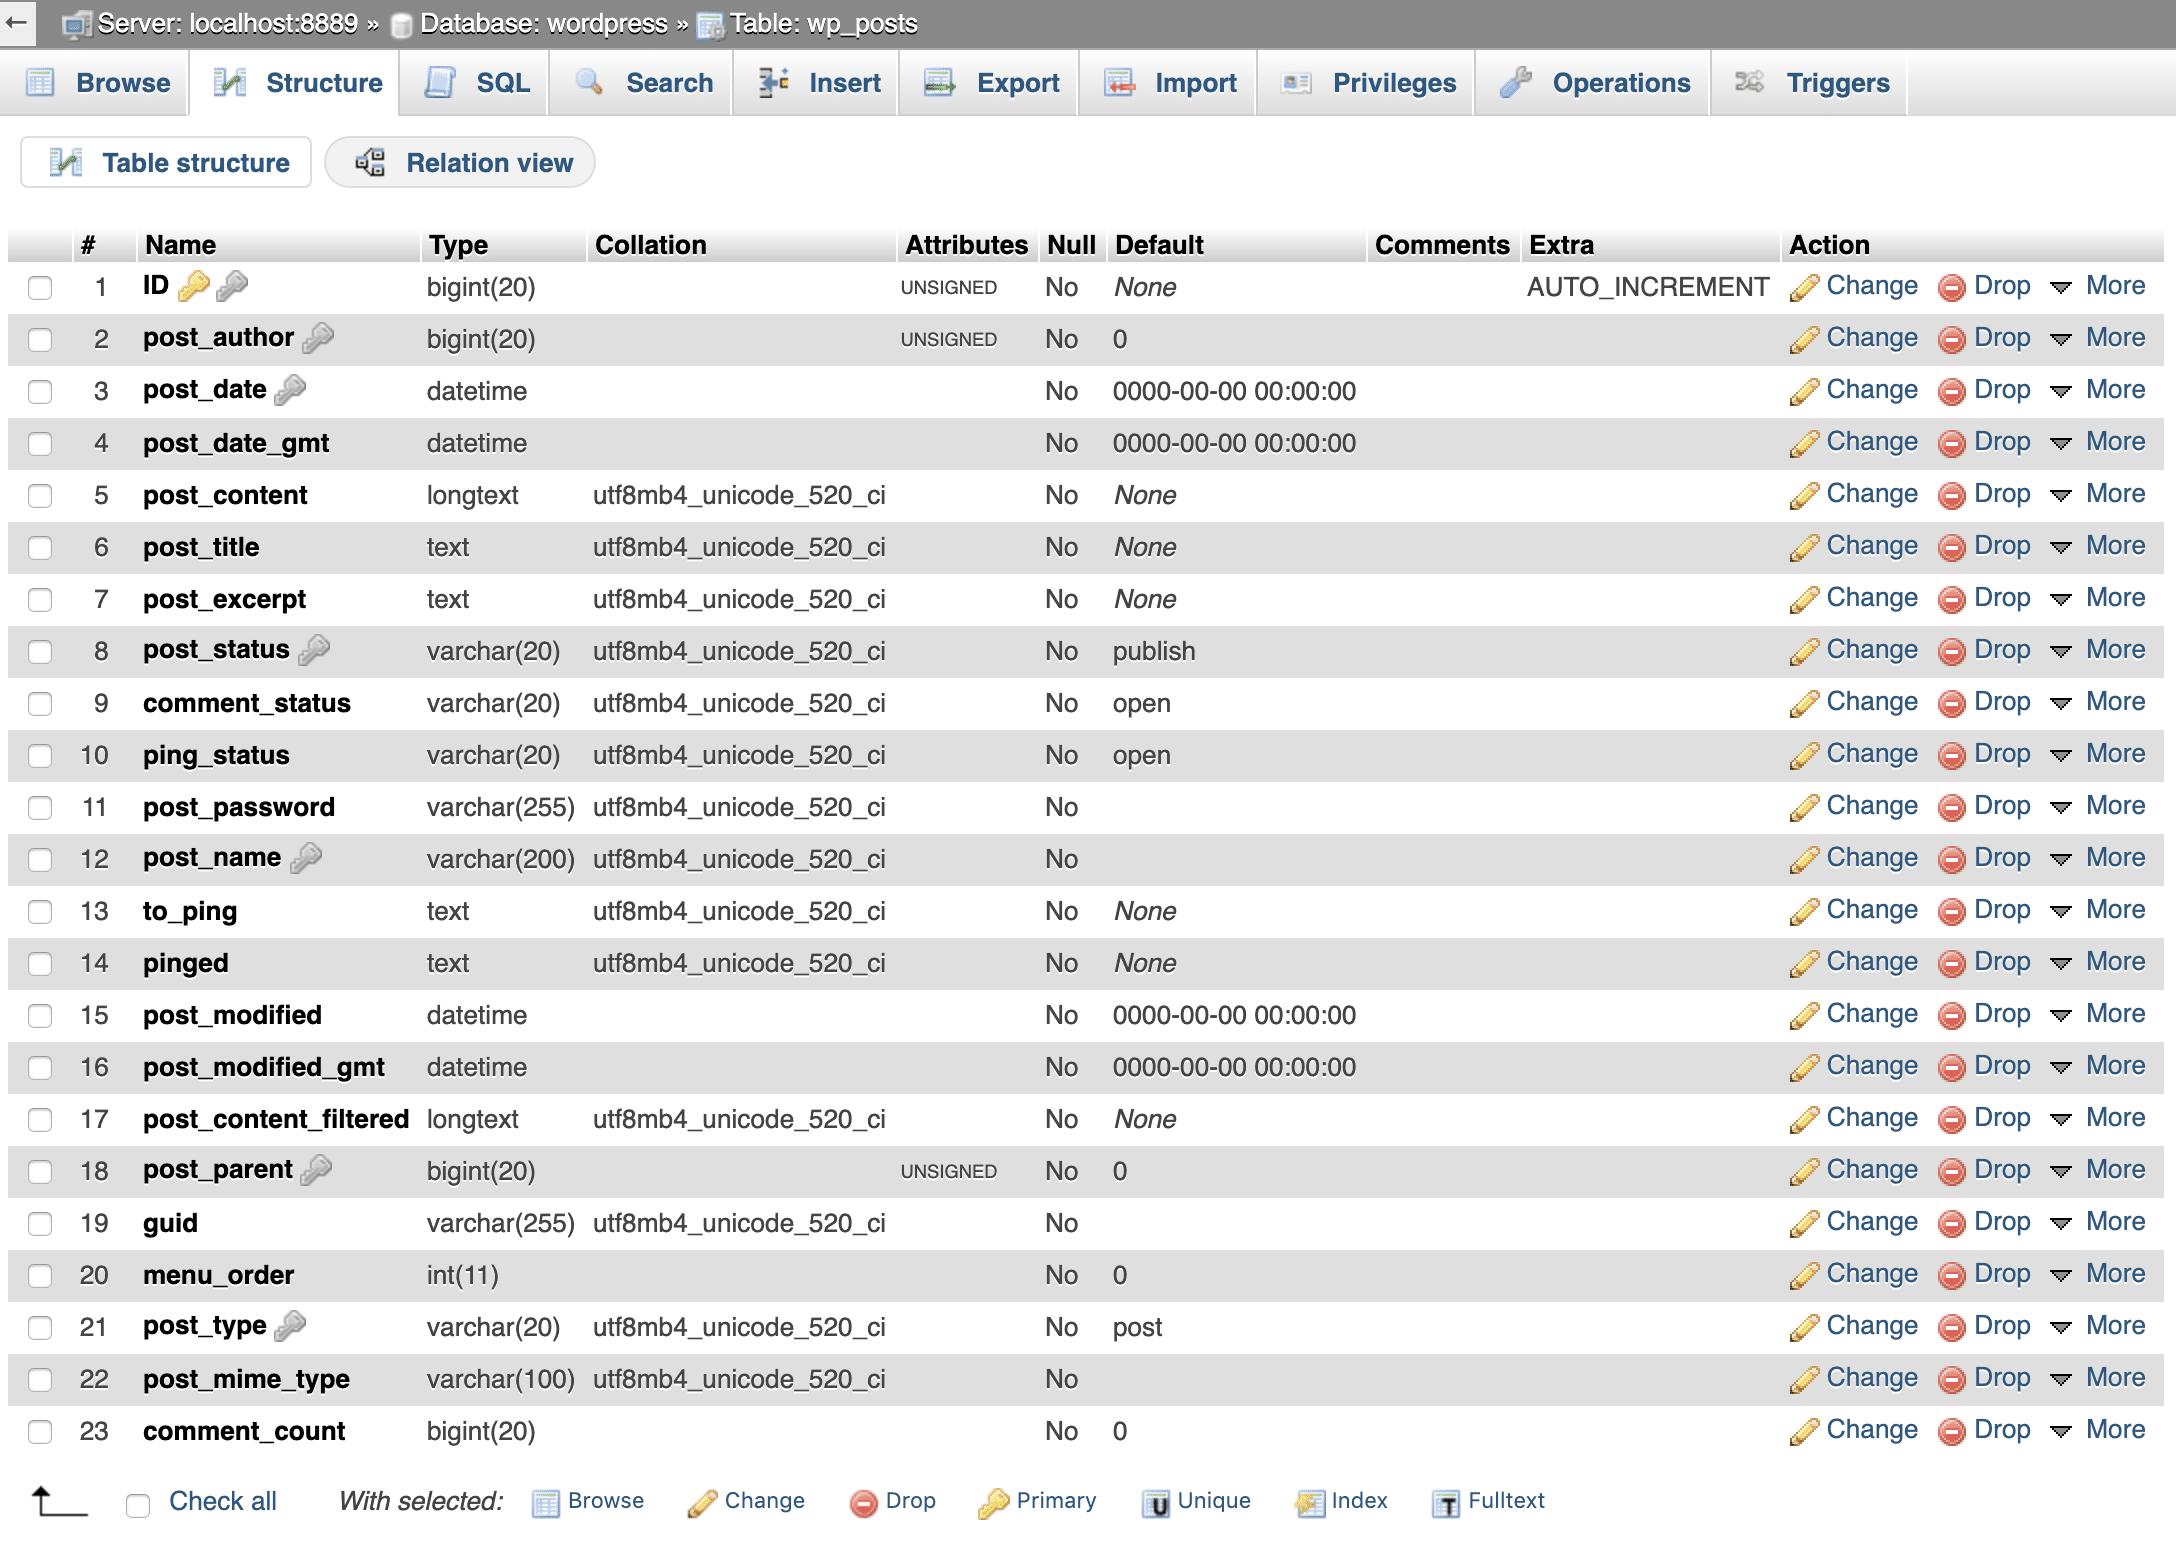 wp_posts tabellstruktur i phpMyAdmin